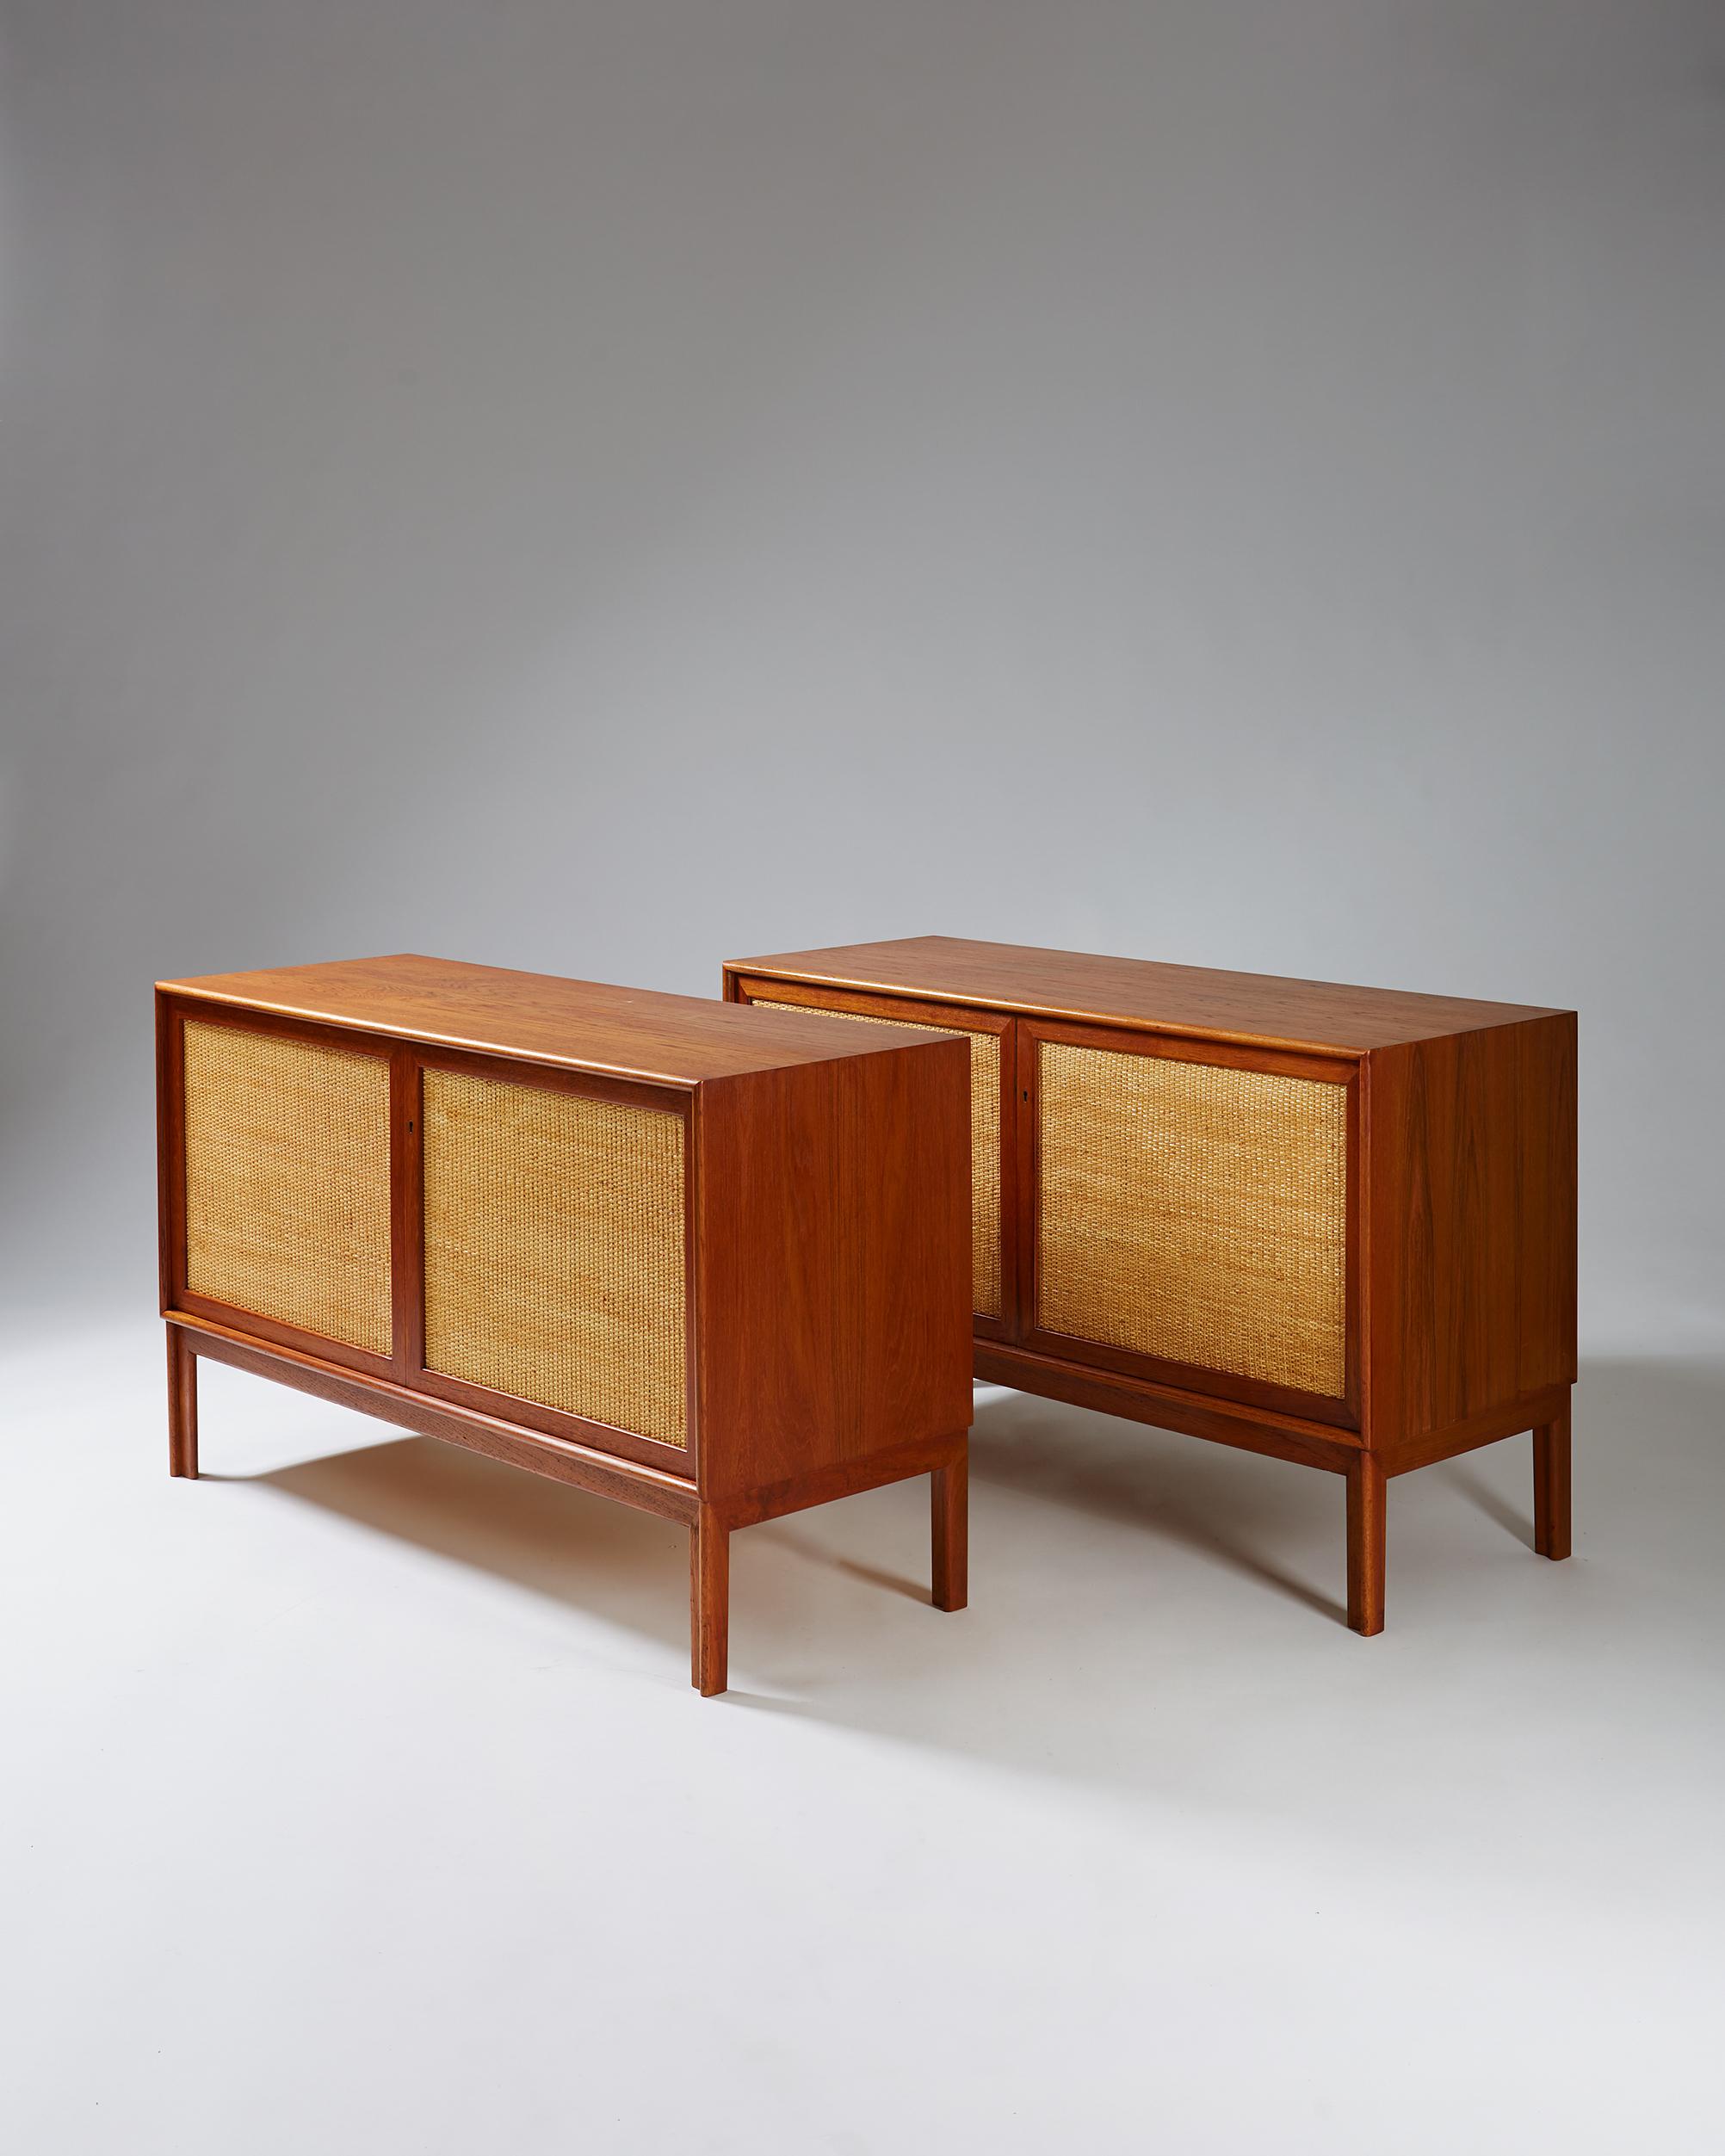 Alf Svensson  Pair of sideboards Sweden. 1950's Teak and cane. 72 x 120 x 45 cm